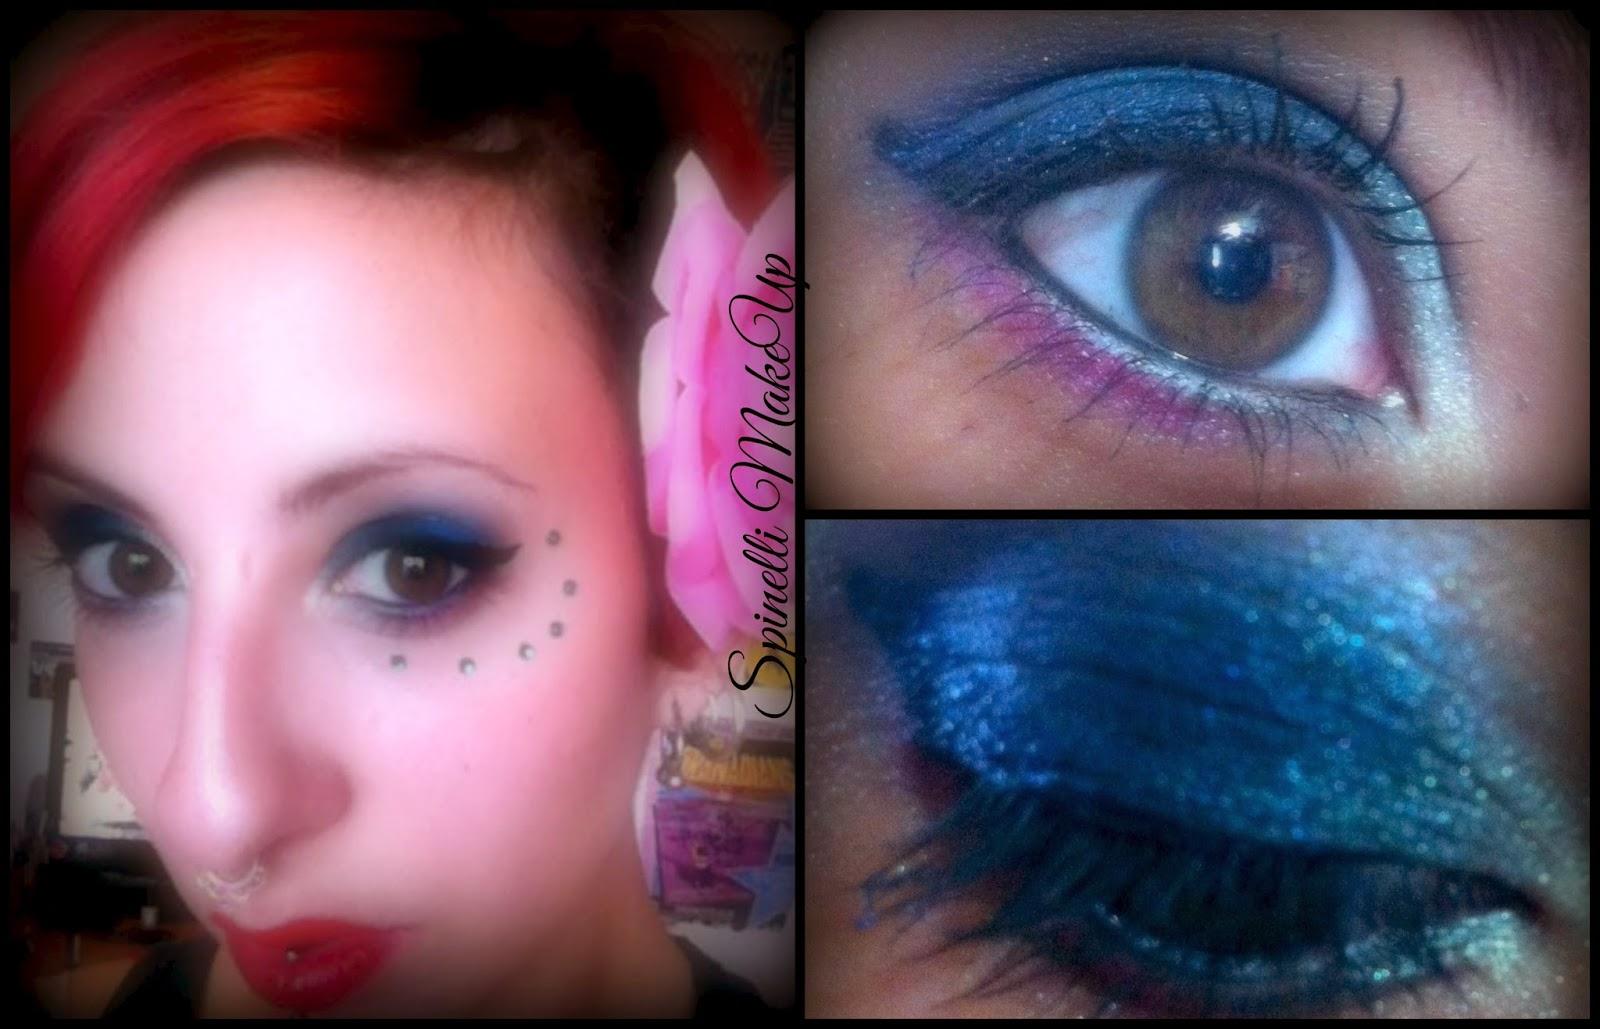 Spinelli MakeUp: octubre 2014